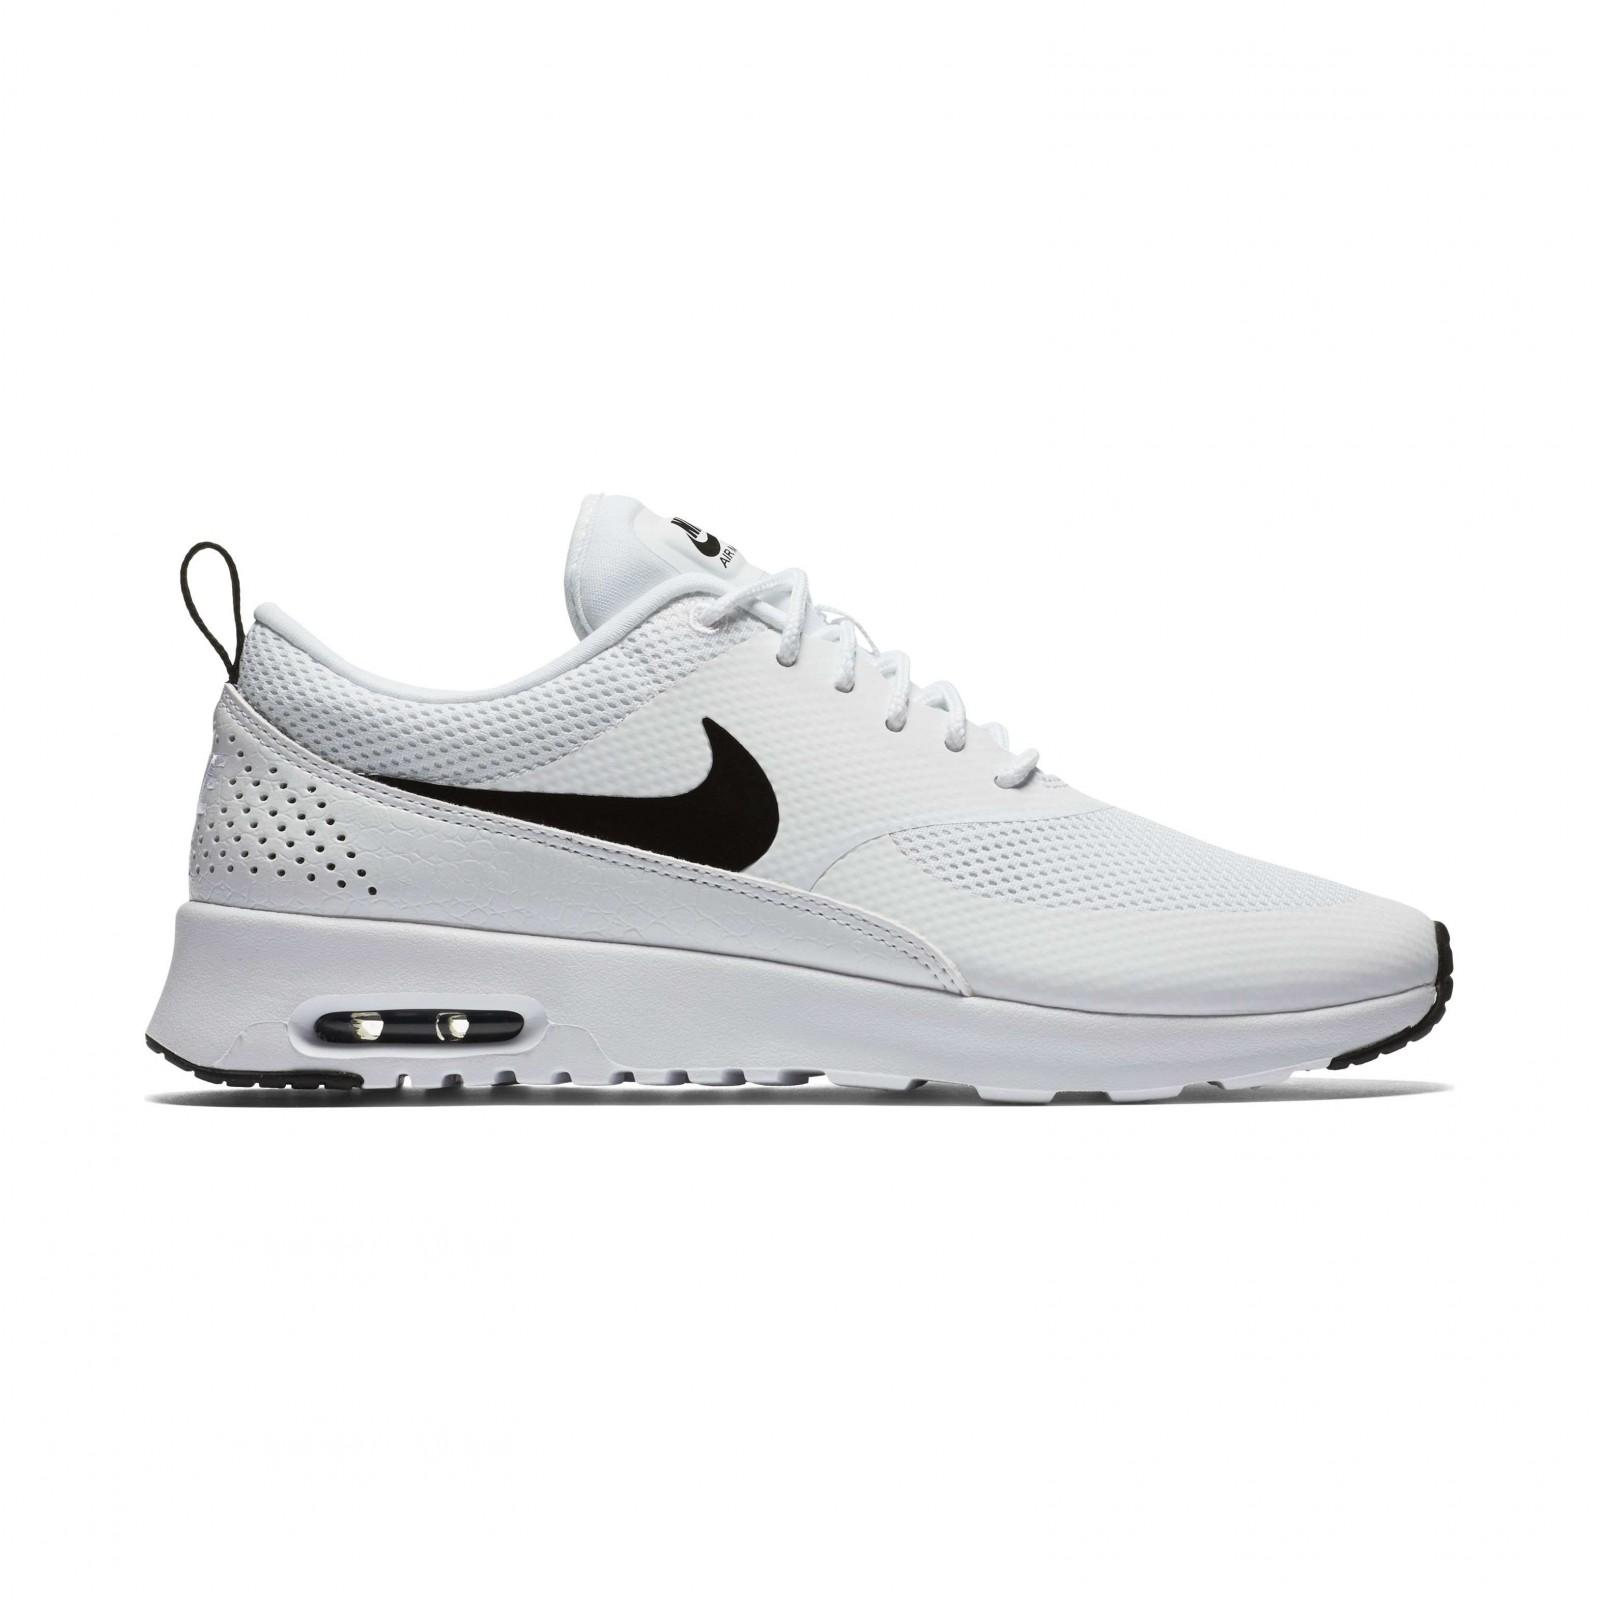 964ad19883 Dámské boty Nike WMNS AIR MAX THEA